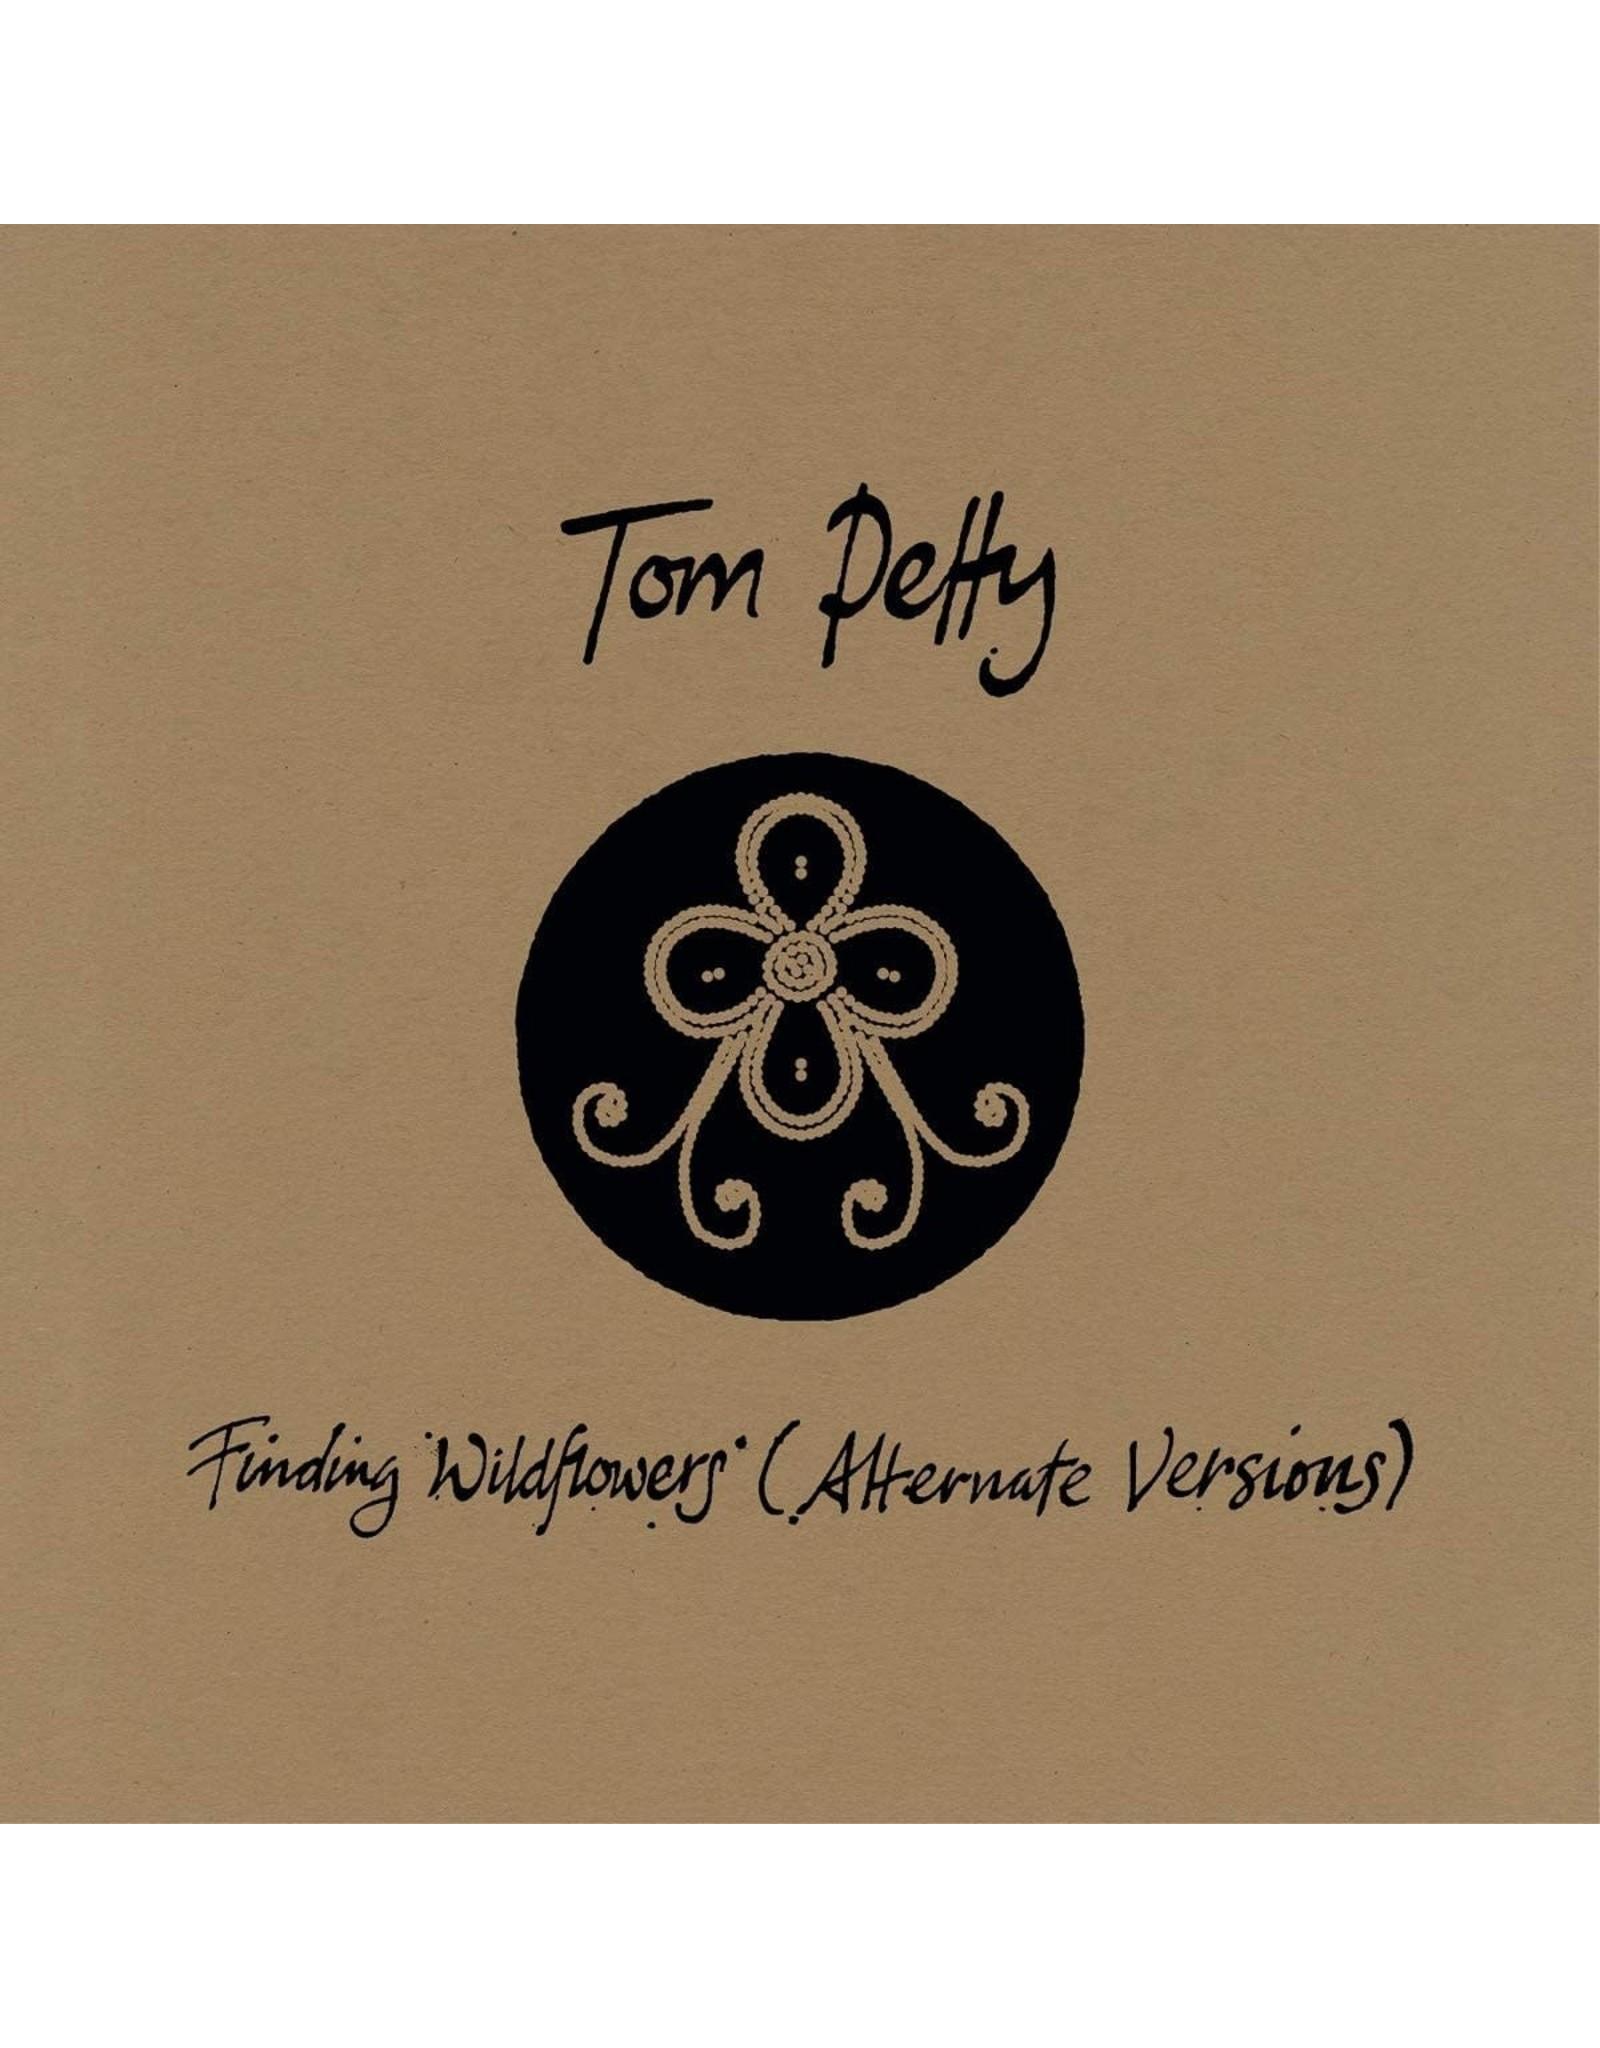 Tom Petty - Finding Wildflowers (Alternate Versions) [Exclusive Gold Vinyl]